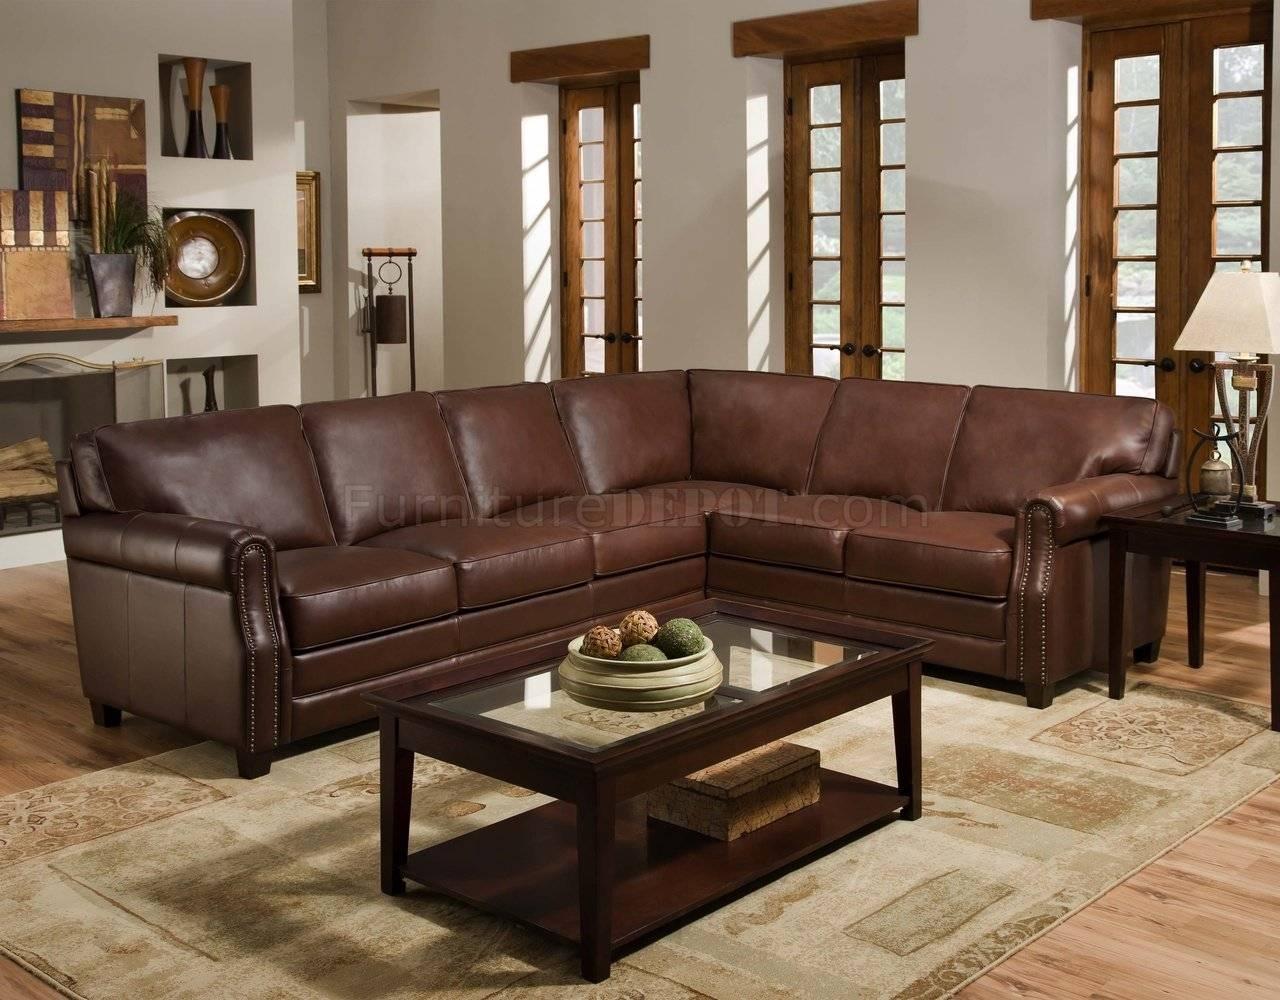 Cocoa Brown Top Grain Italian Leather Traditional Sectional Sofa in Traditional Leather Couch (Image 5 of 30)